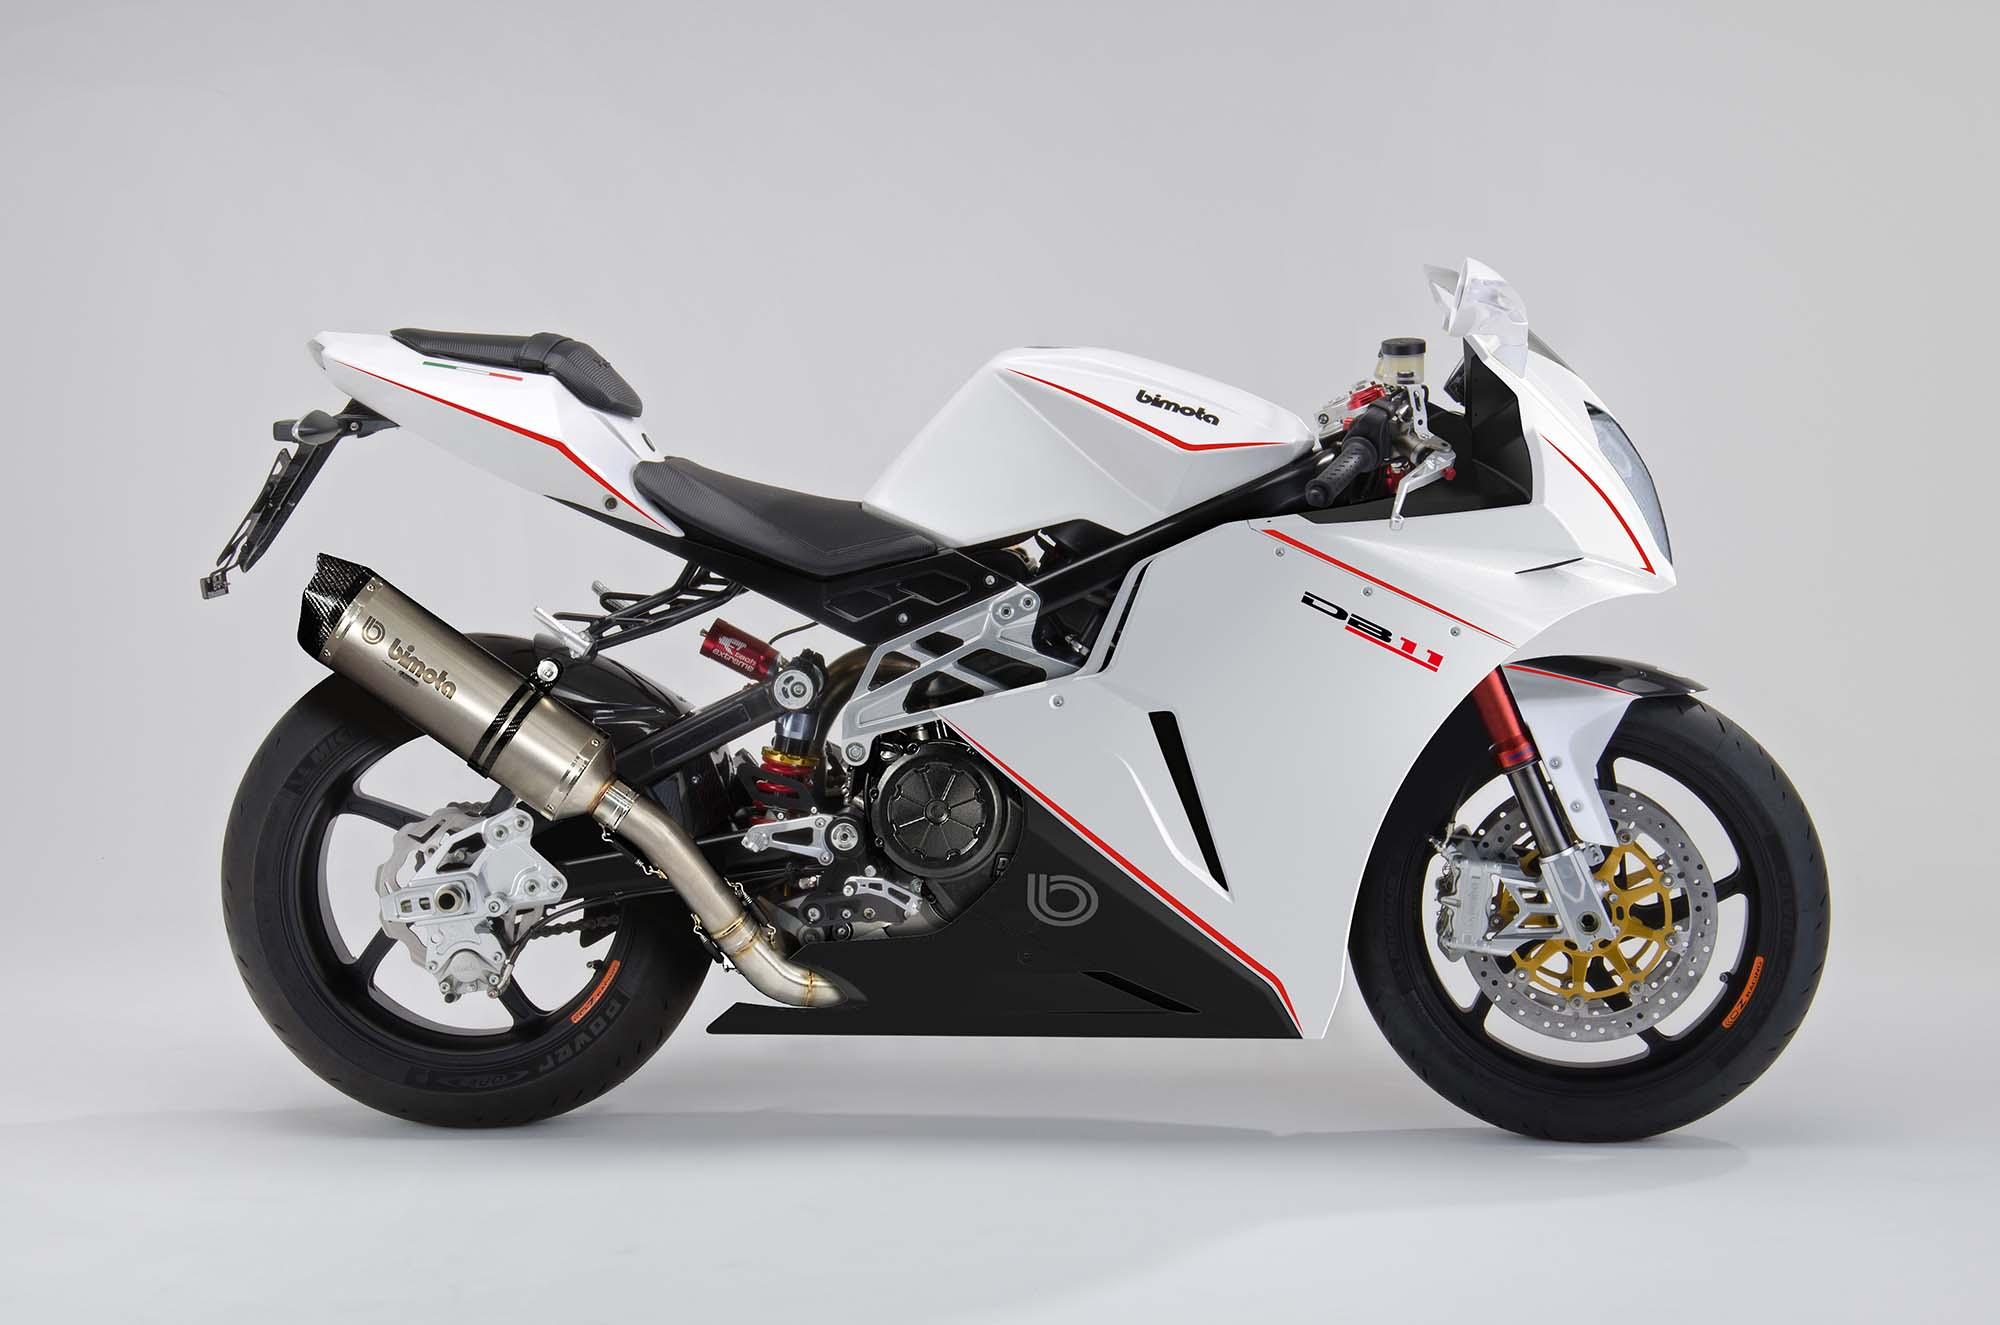 2013 Bimota DB11 - The...